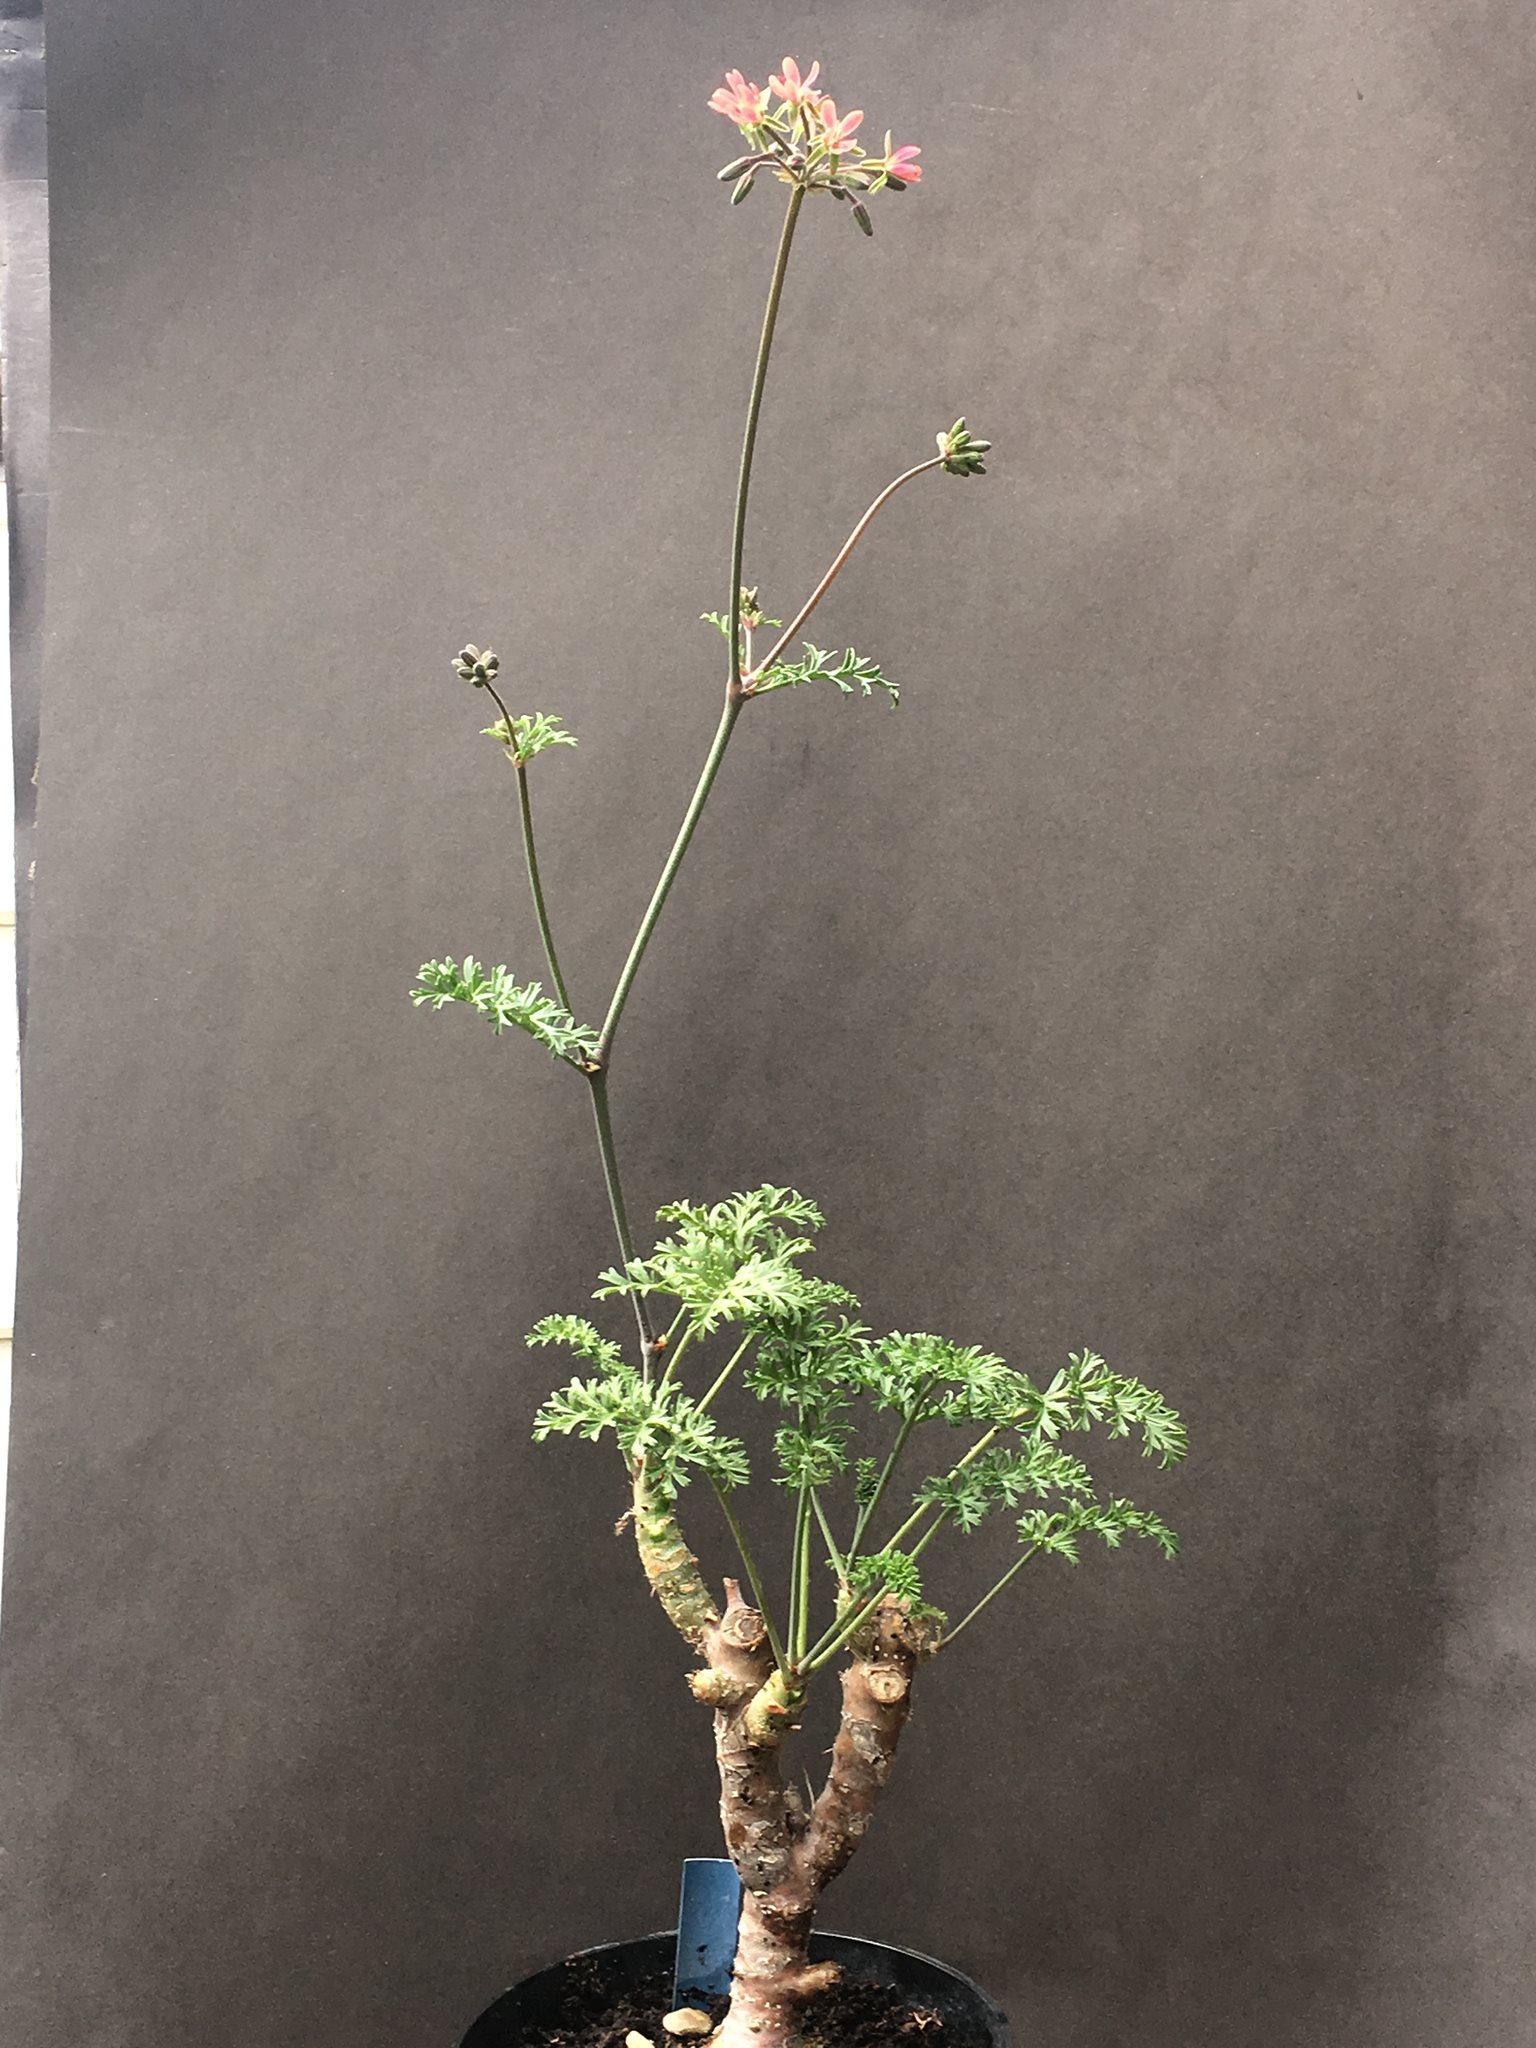 P gibbosum x anethifolium 1. Credit Arjan de Graaf.